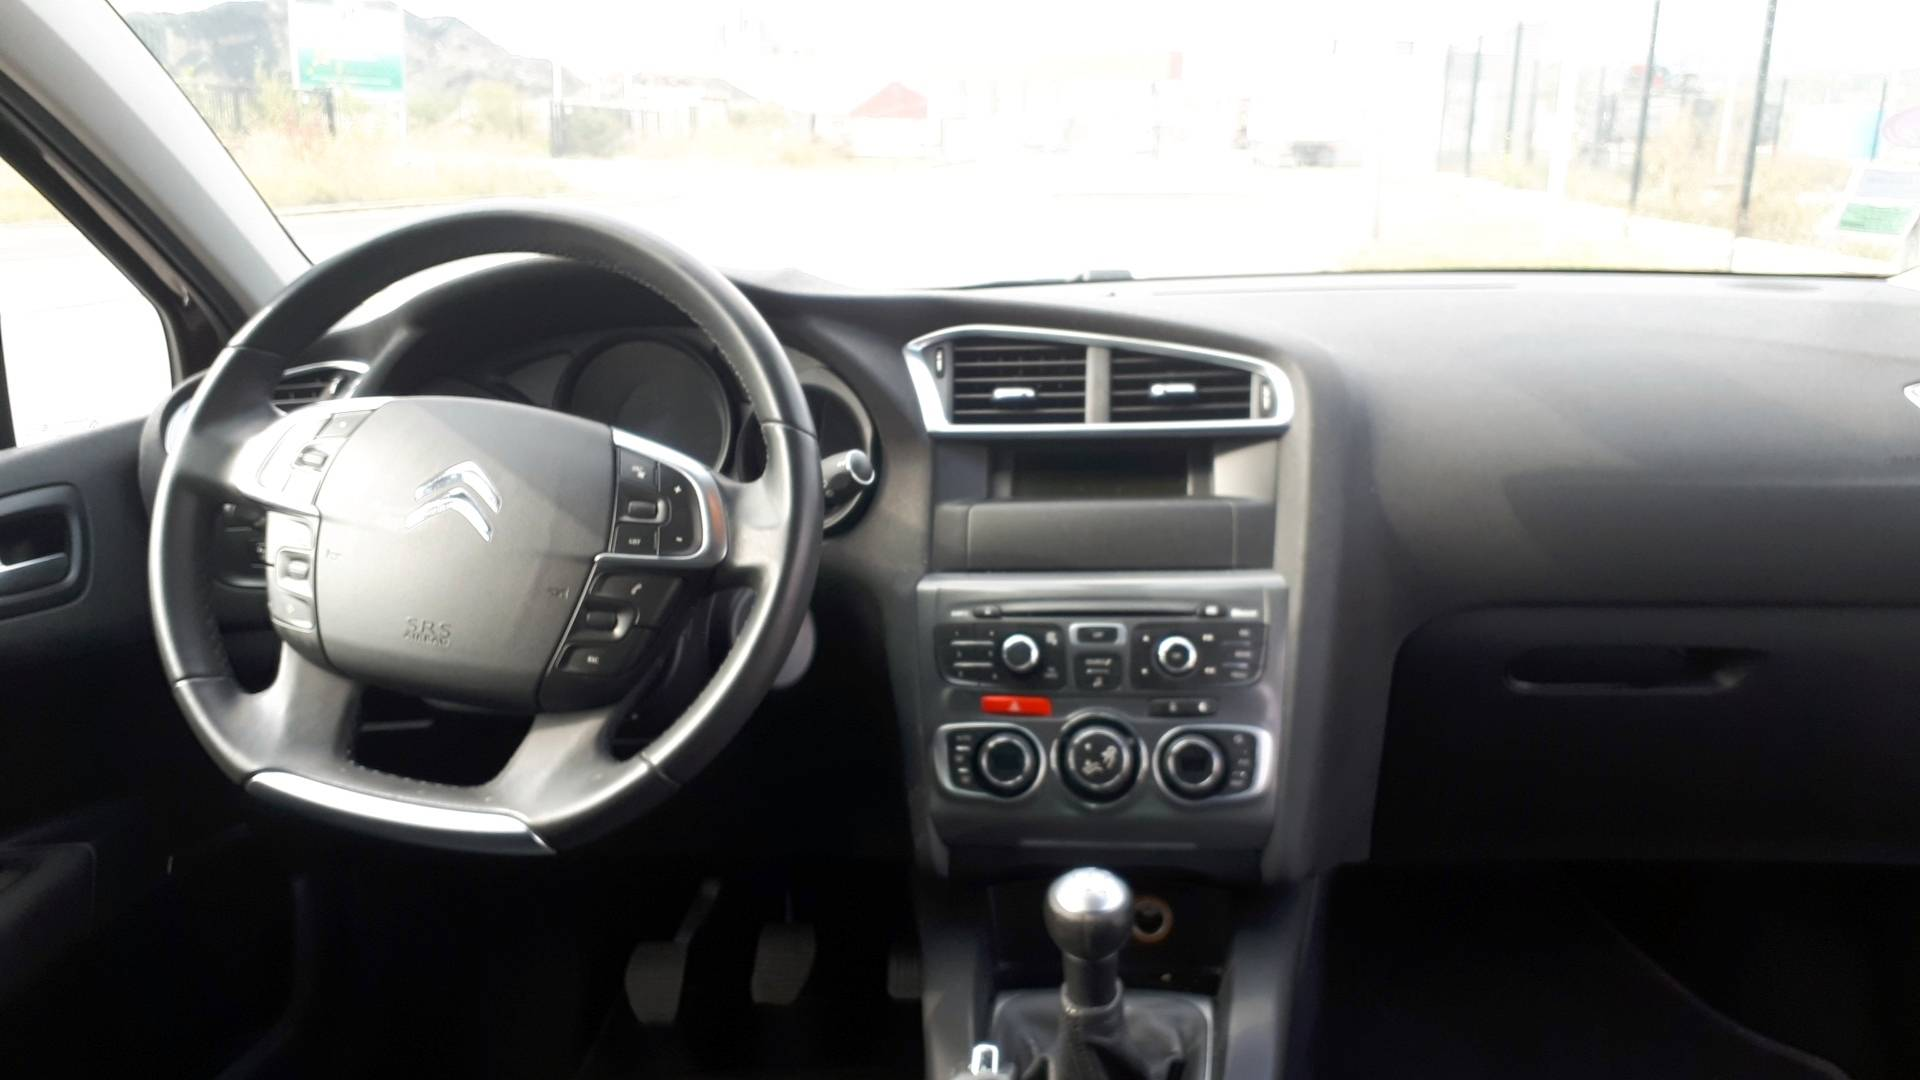 Citroen C4 D Occasion 1 6 Vti 120 Confort Cachan Cedex Carizy